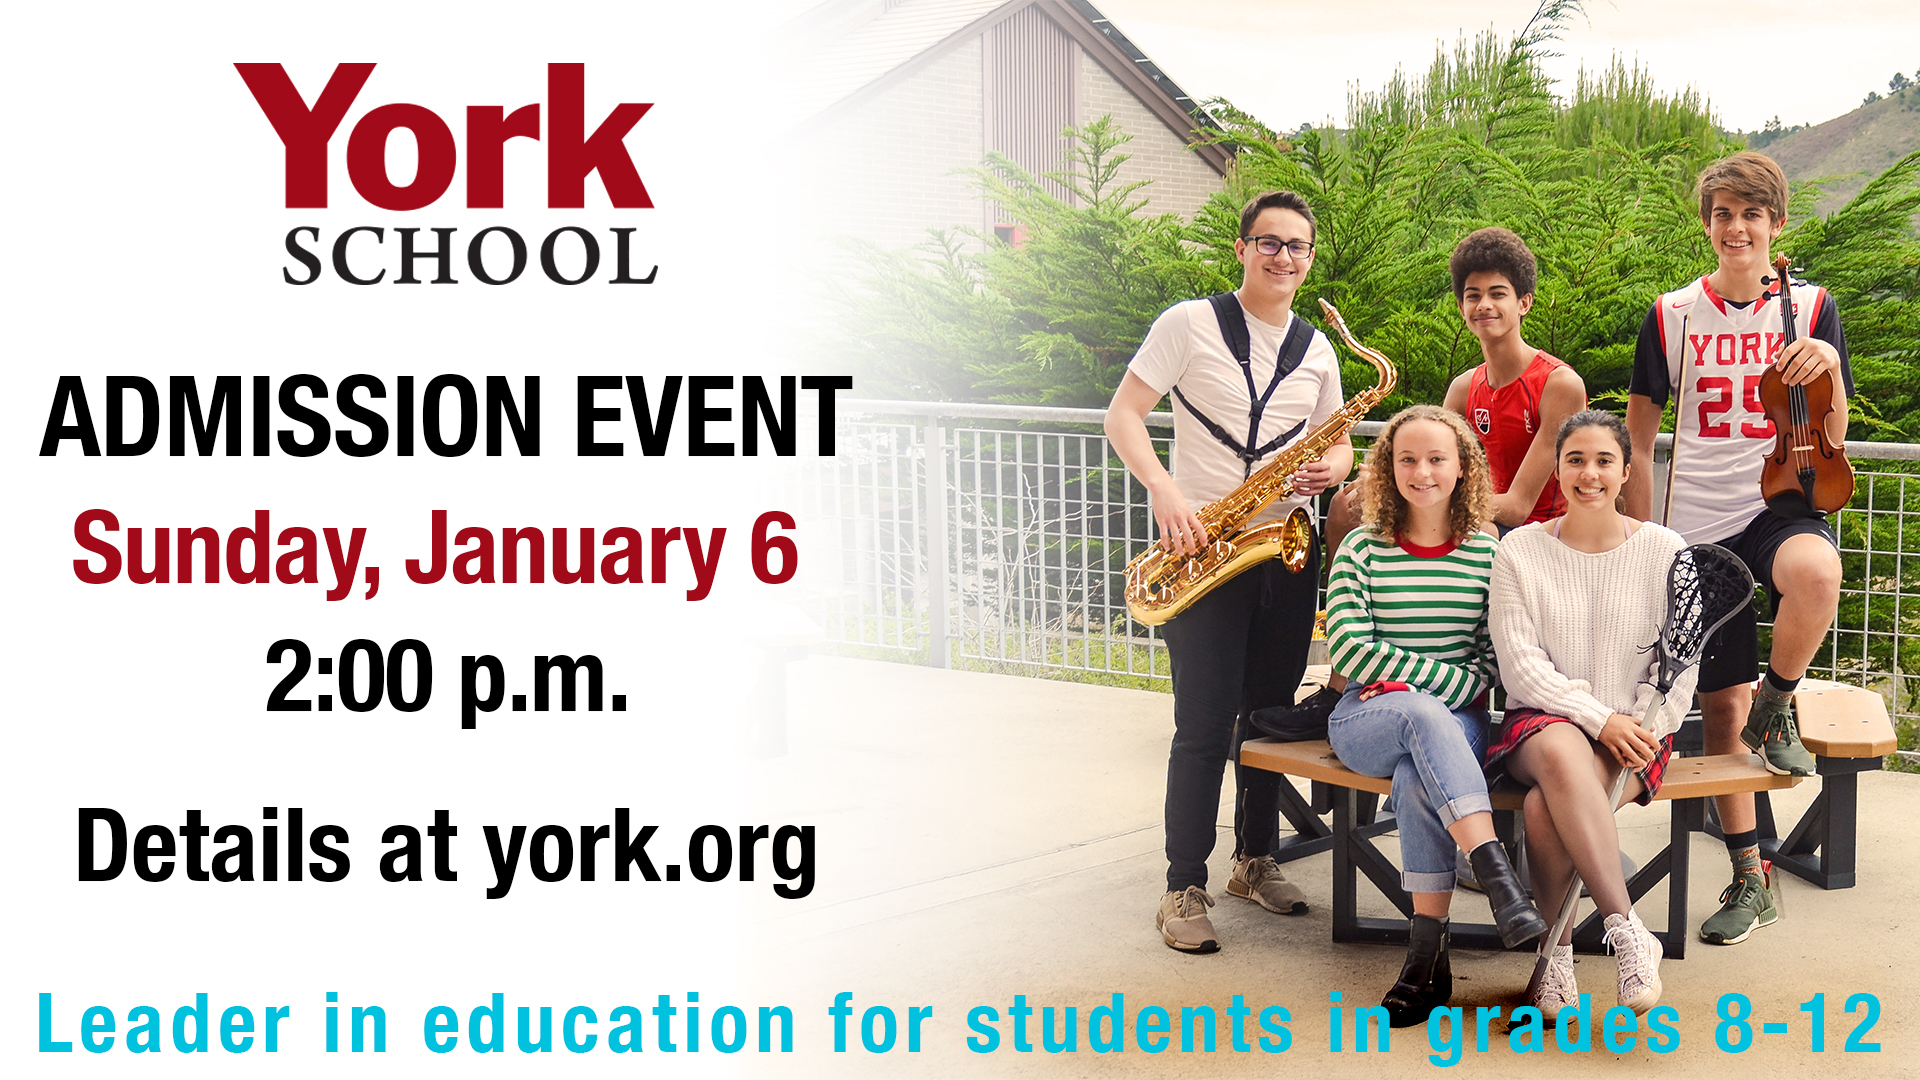 York School Admission Event Photo January 6 2:00 pm